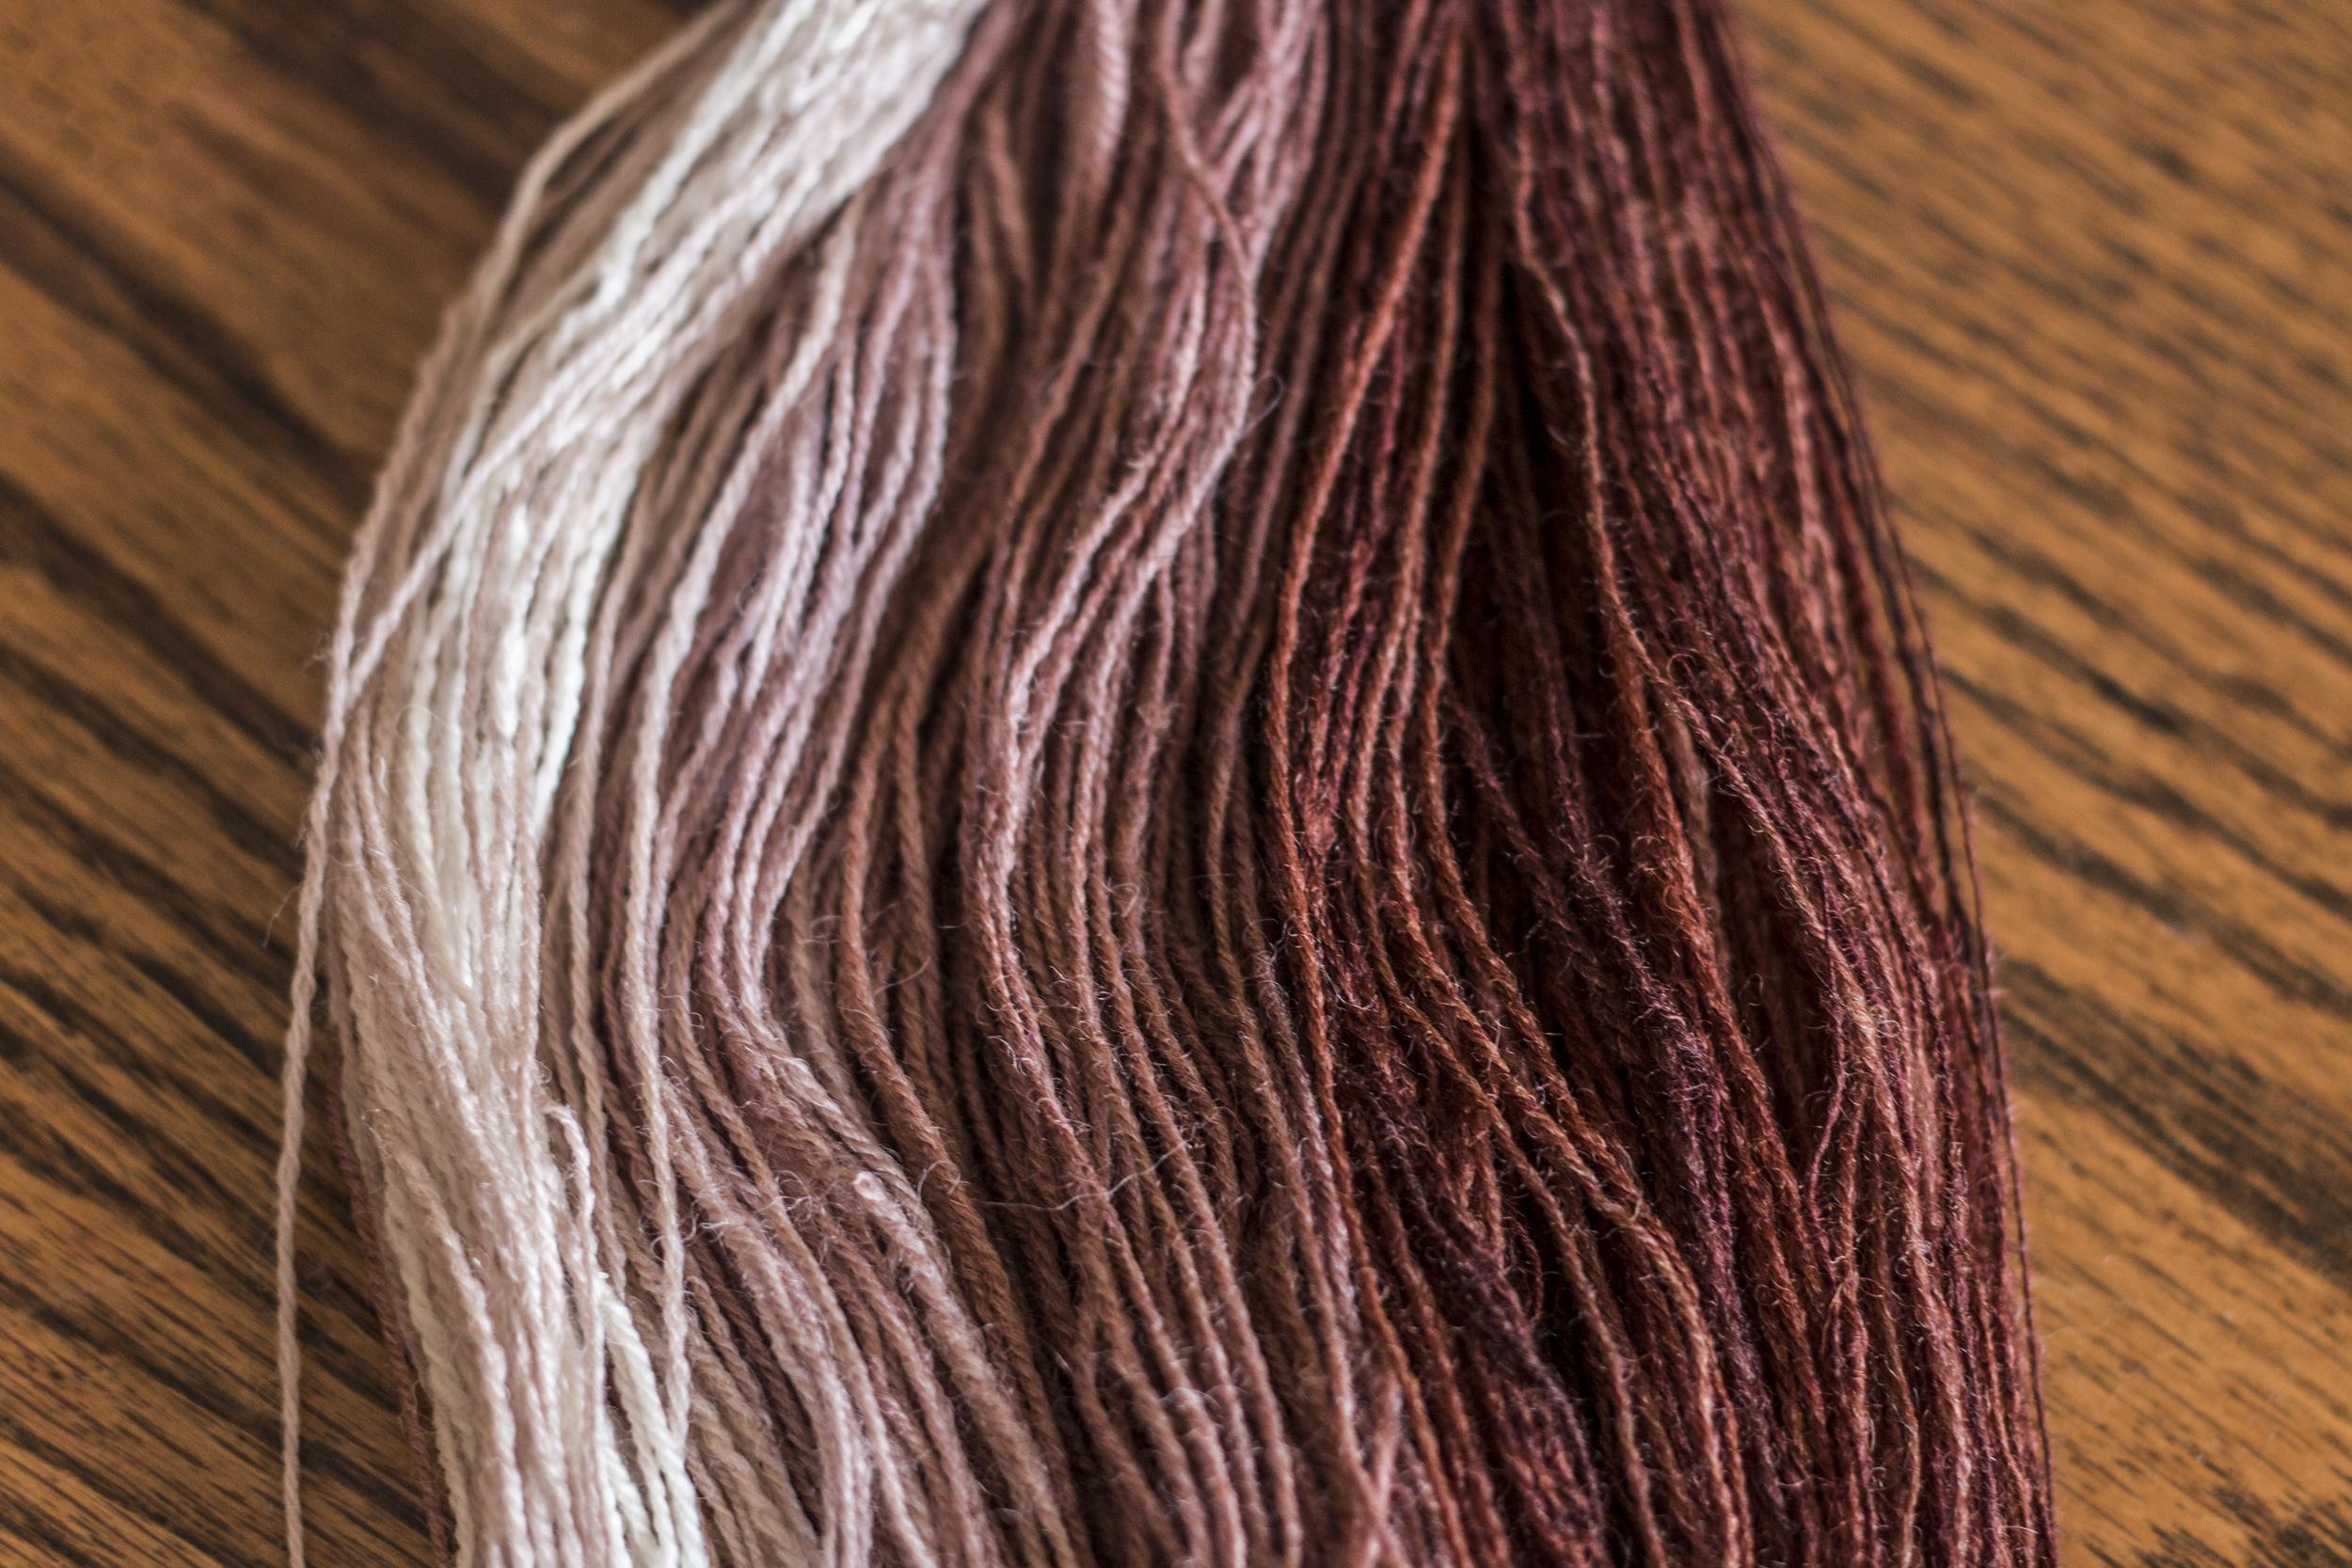 Gradient handspun yarn